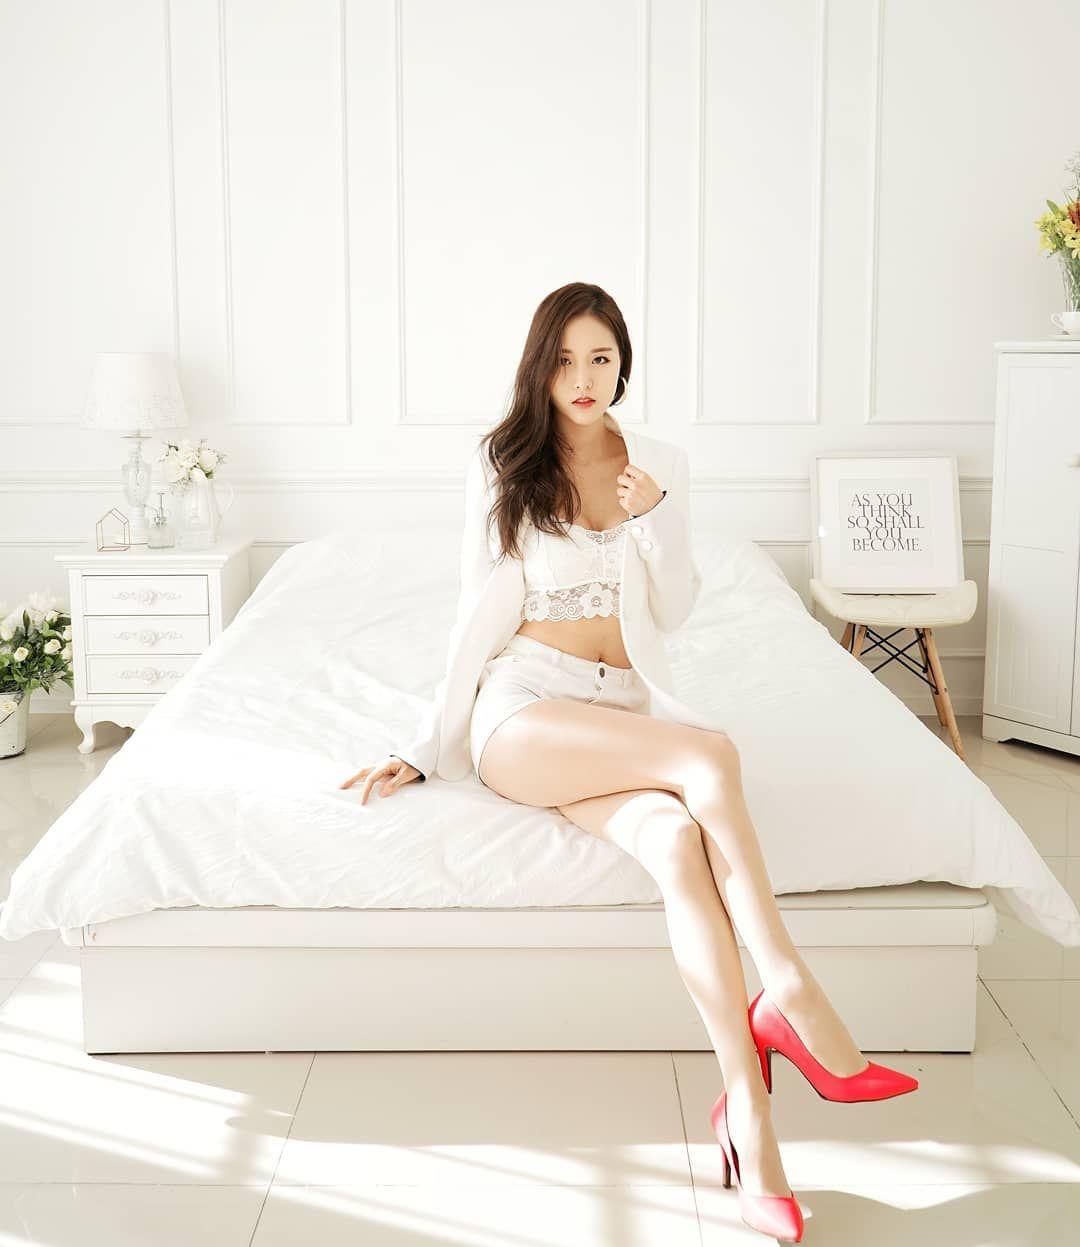 Jae Young (재영) - 20190907 - September 2019 Collection - TruePic.net